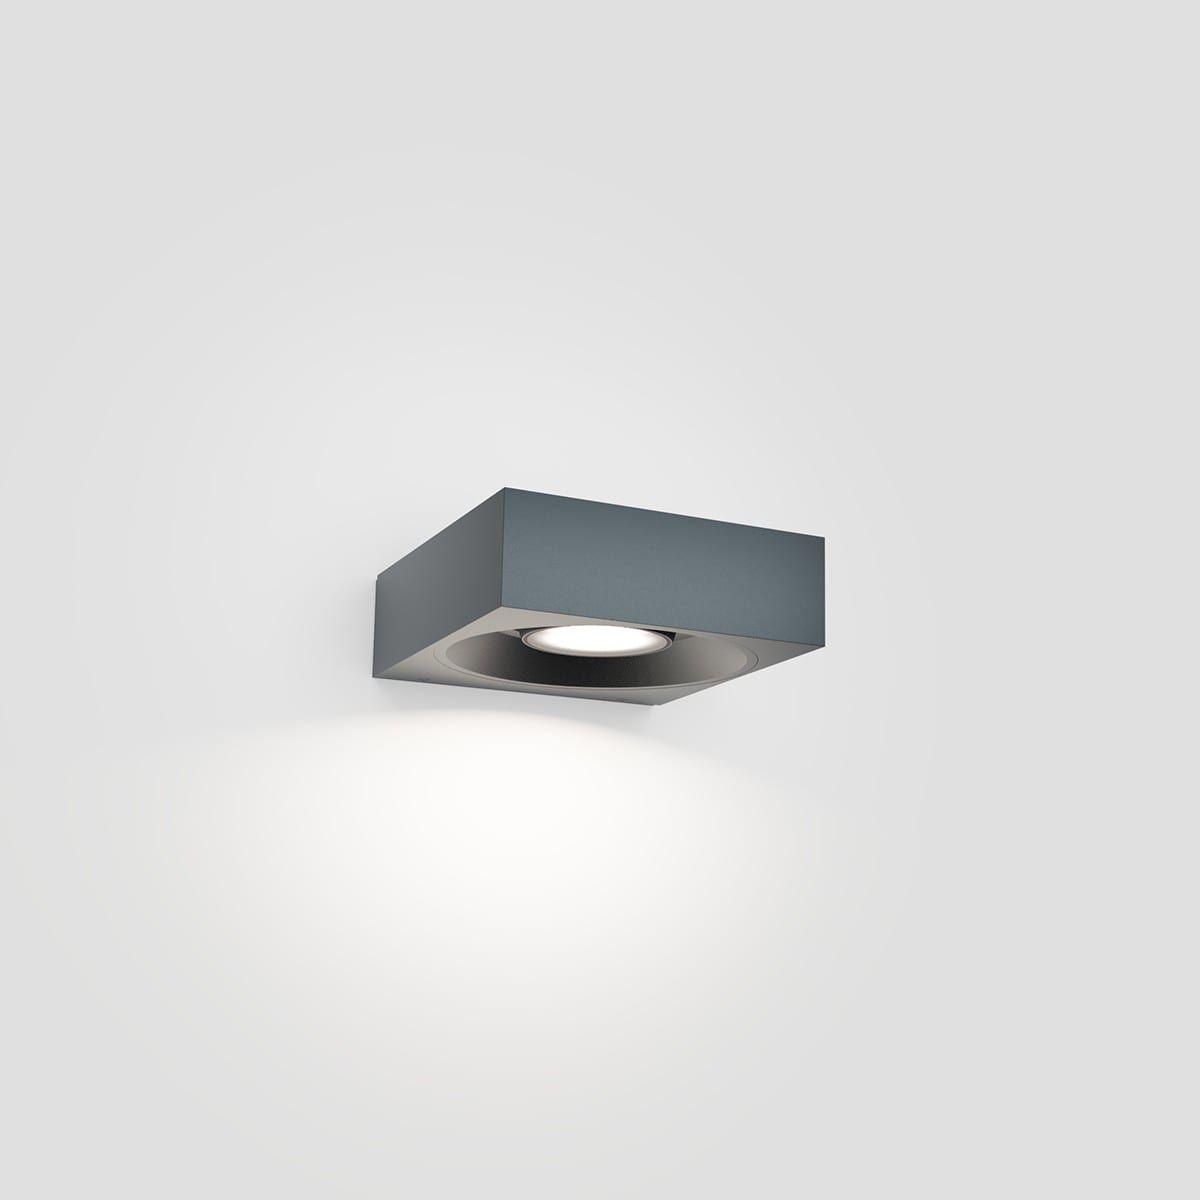 RGB LED Außen Wand Leuchte Fernbedienung Terrassen Beleuchtung E27 Big Light